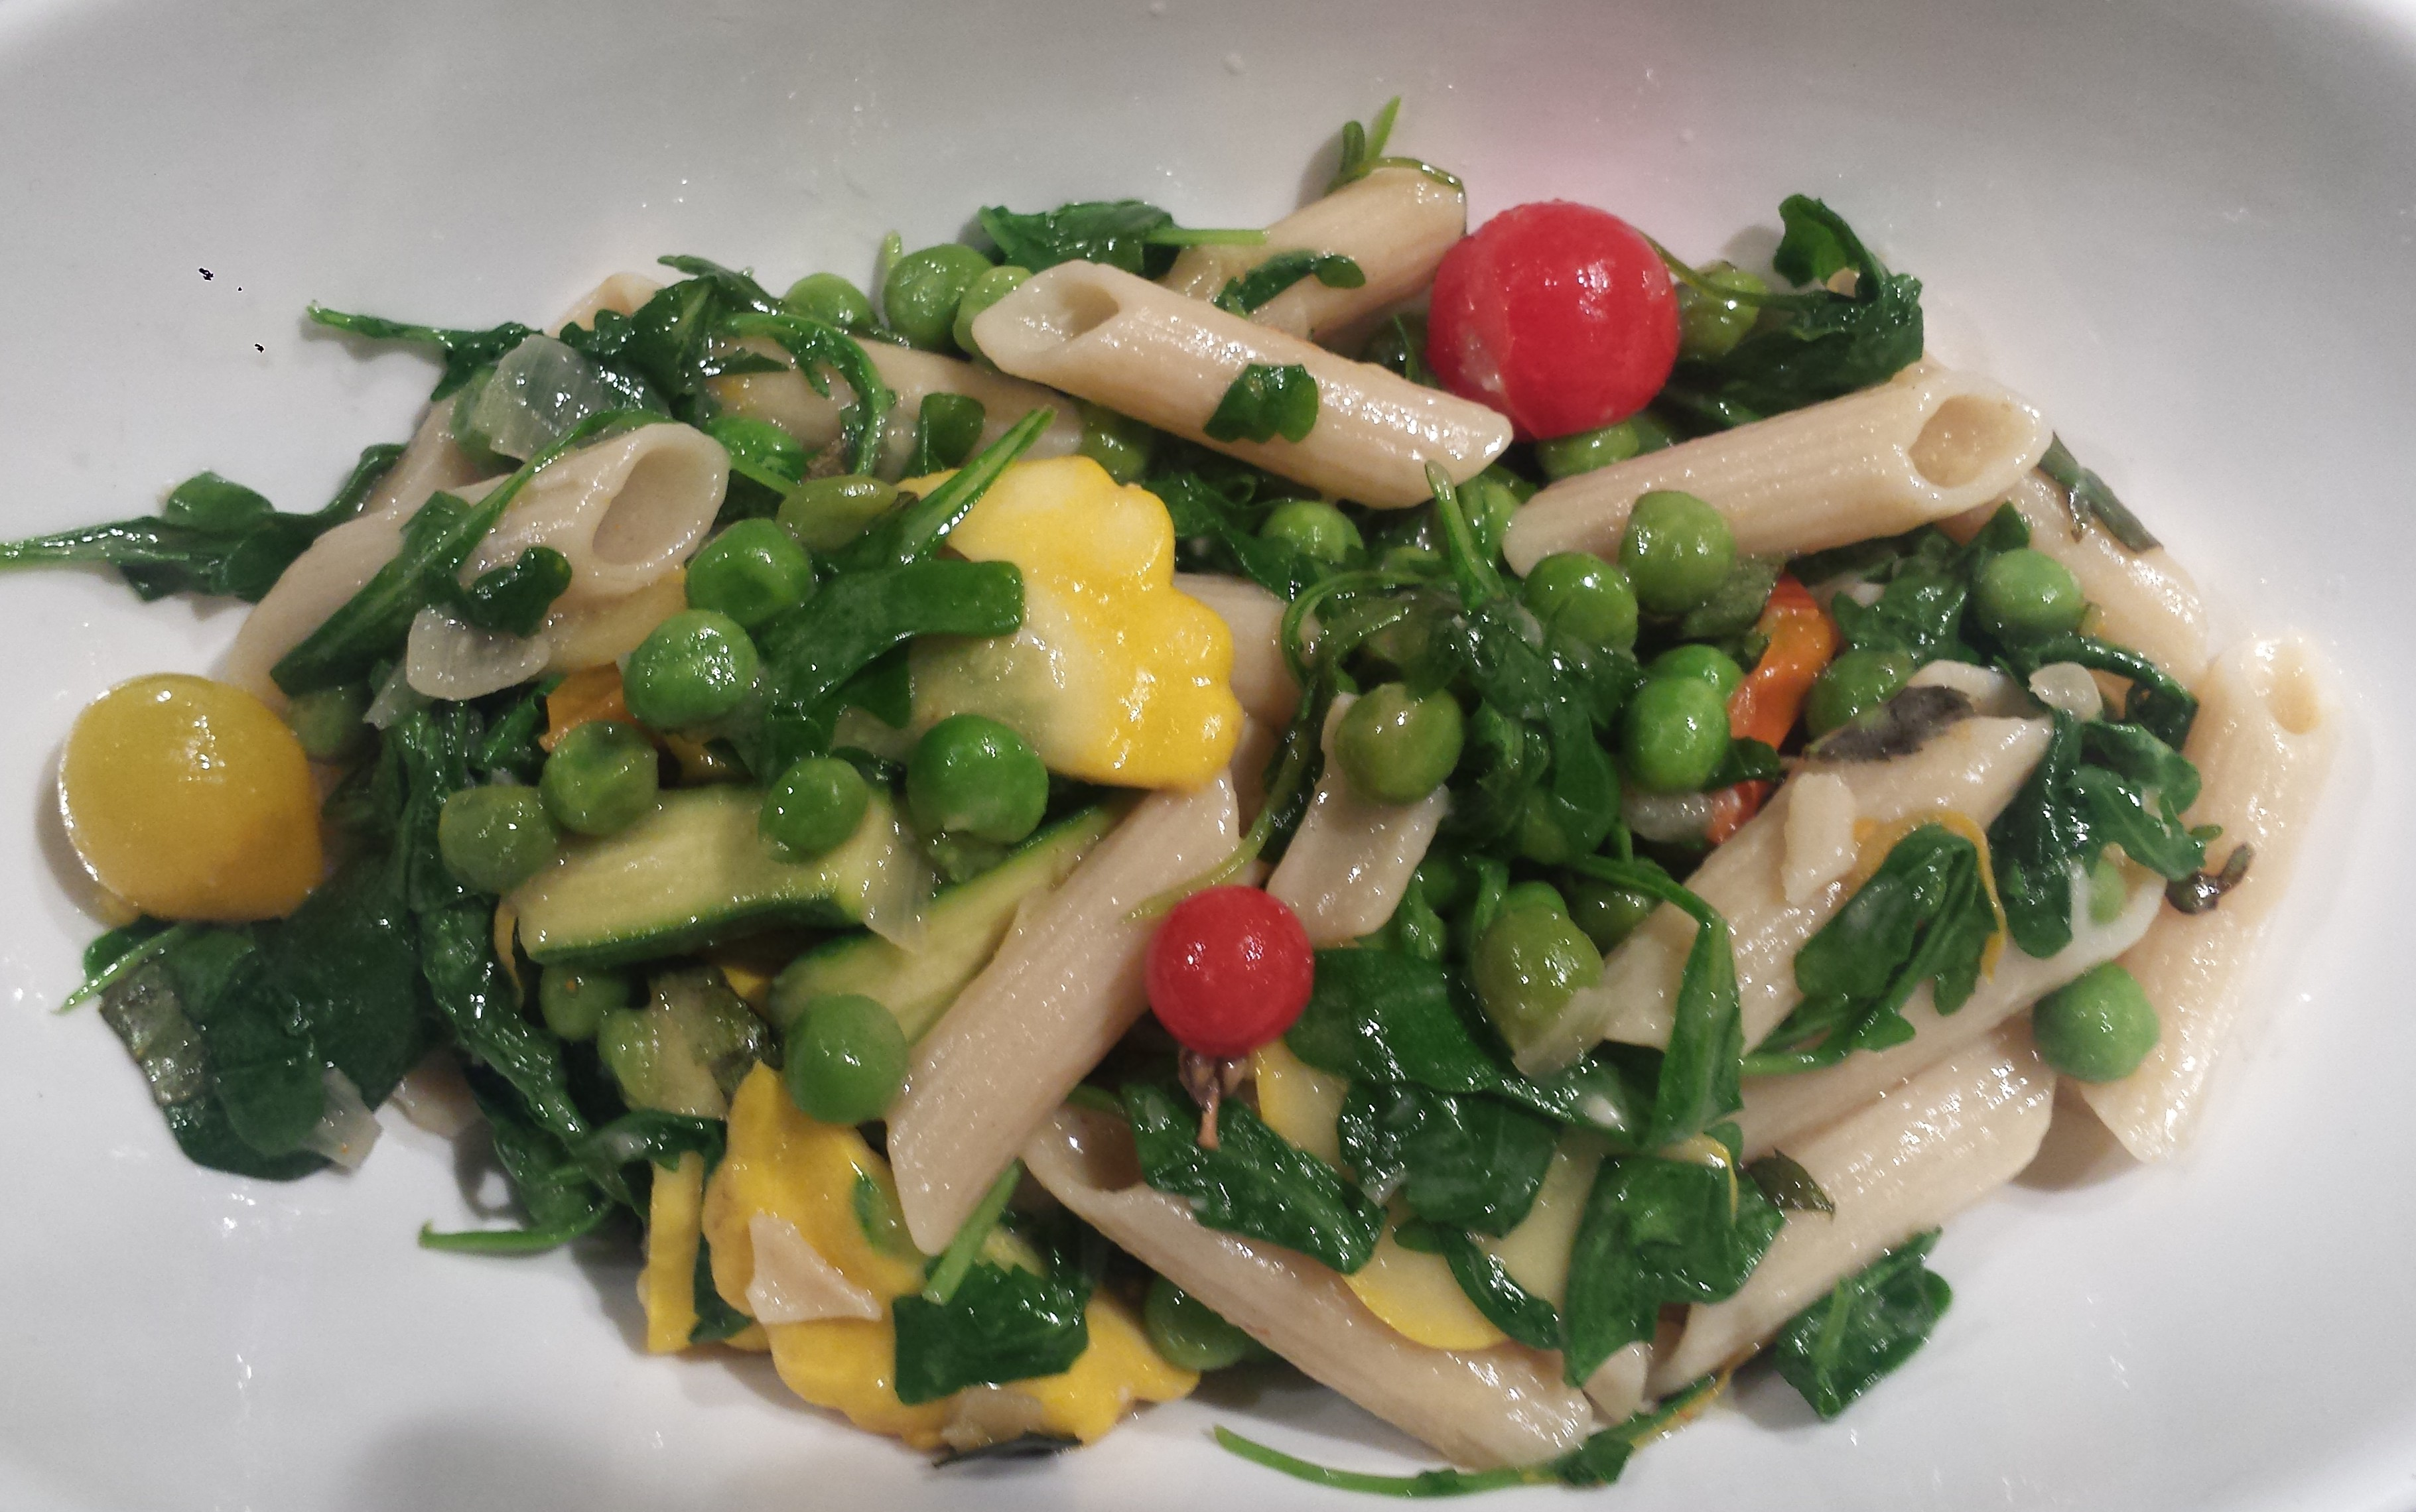 Meatless Monday – Pasta Primavera with Summer Squash, Peas and ...